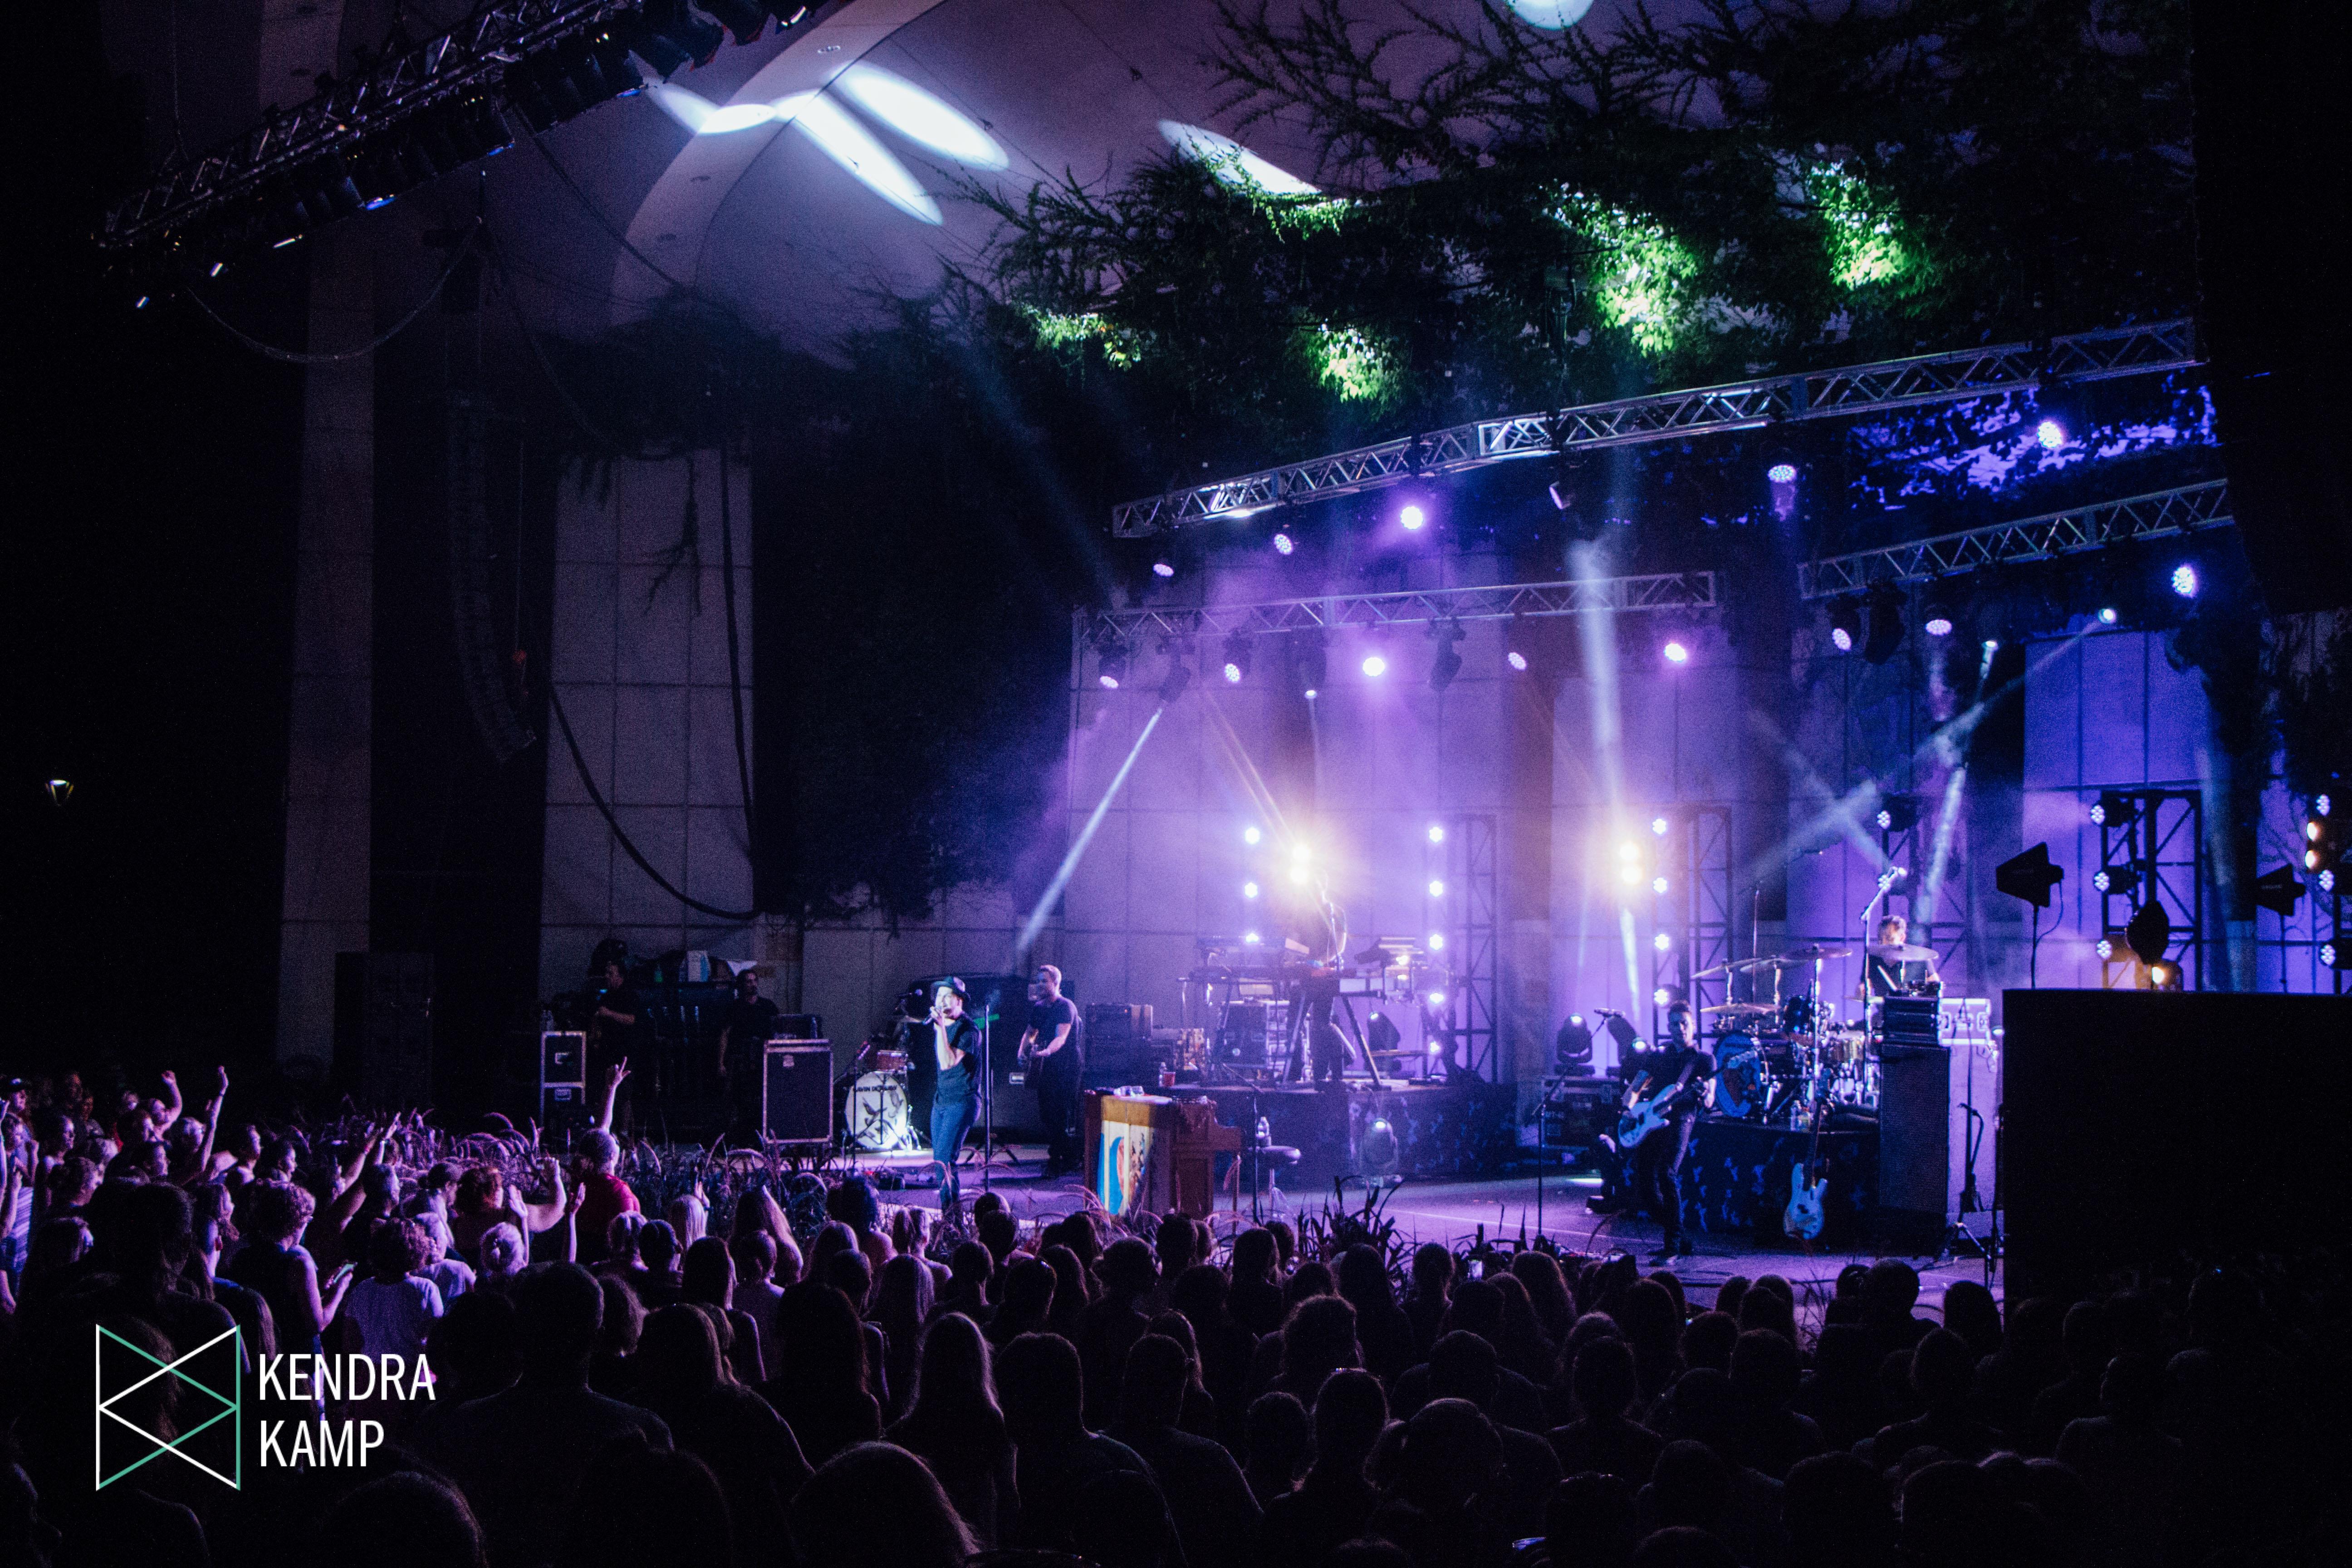 Gavin Degraw Concert Cut Short By Lightning At Meijer Gardens